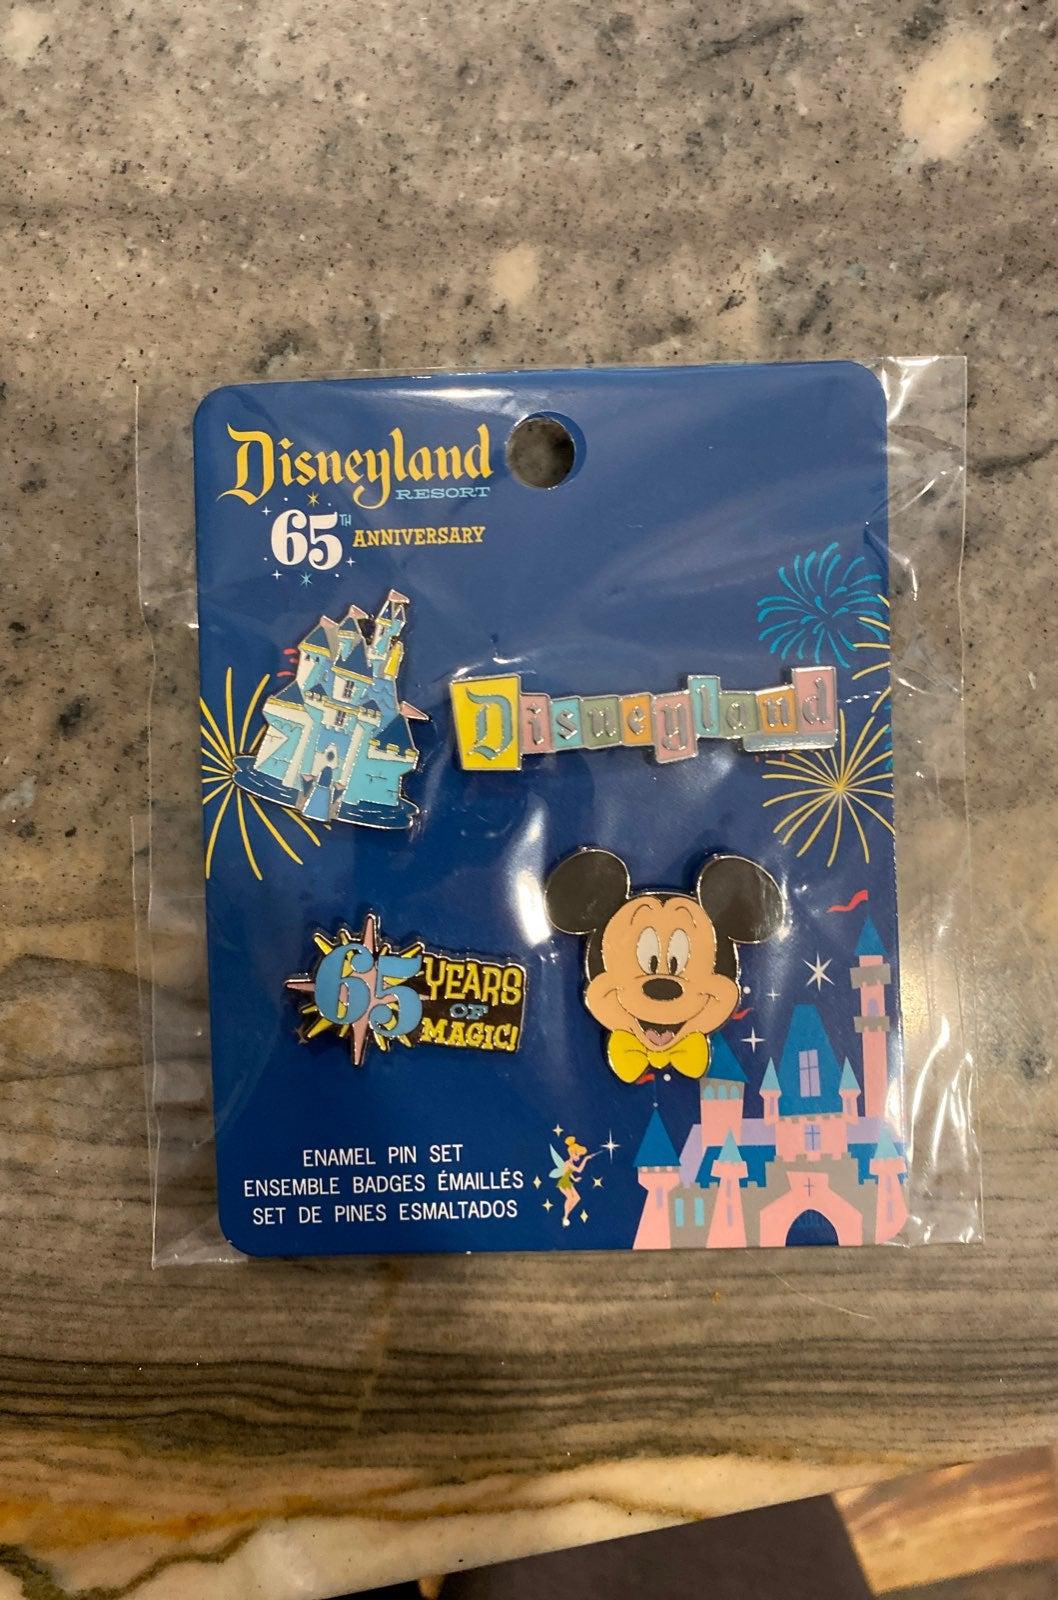 Disney 65th Anniversary pin set